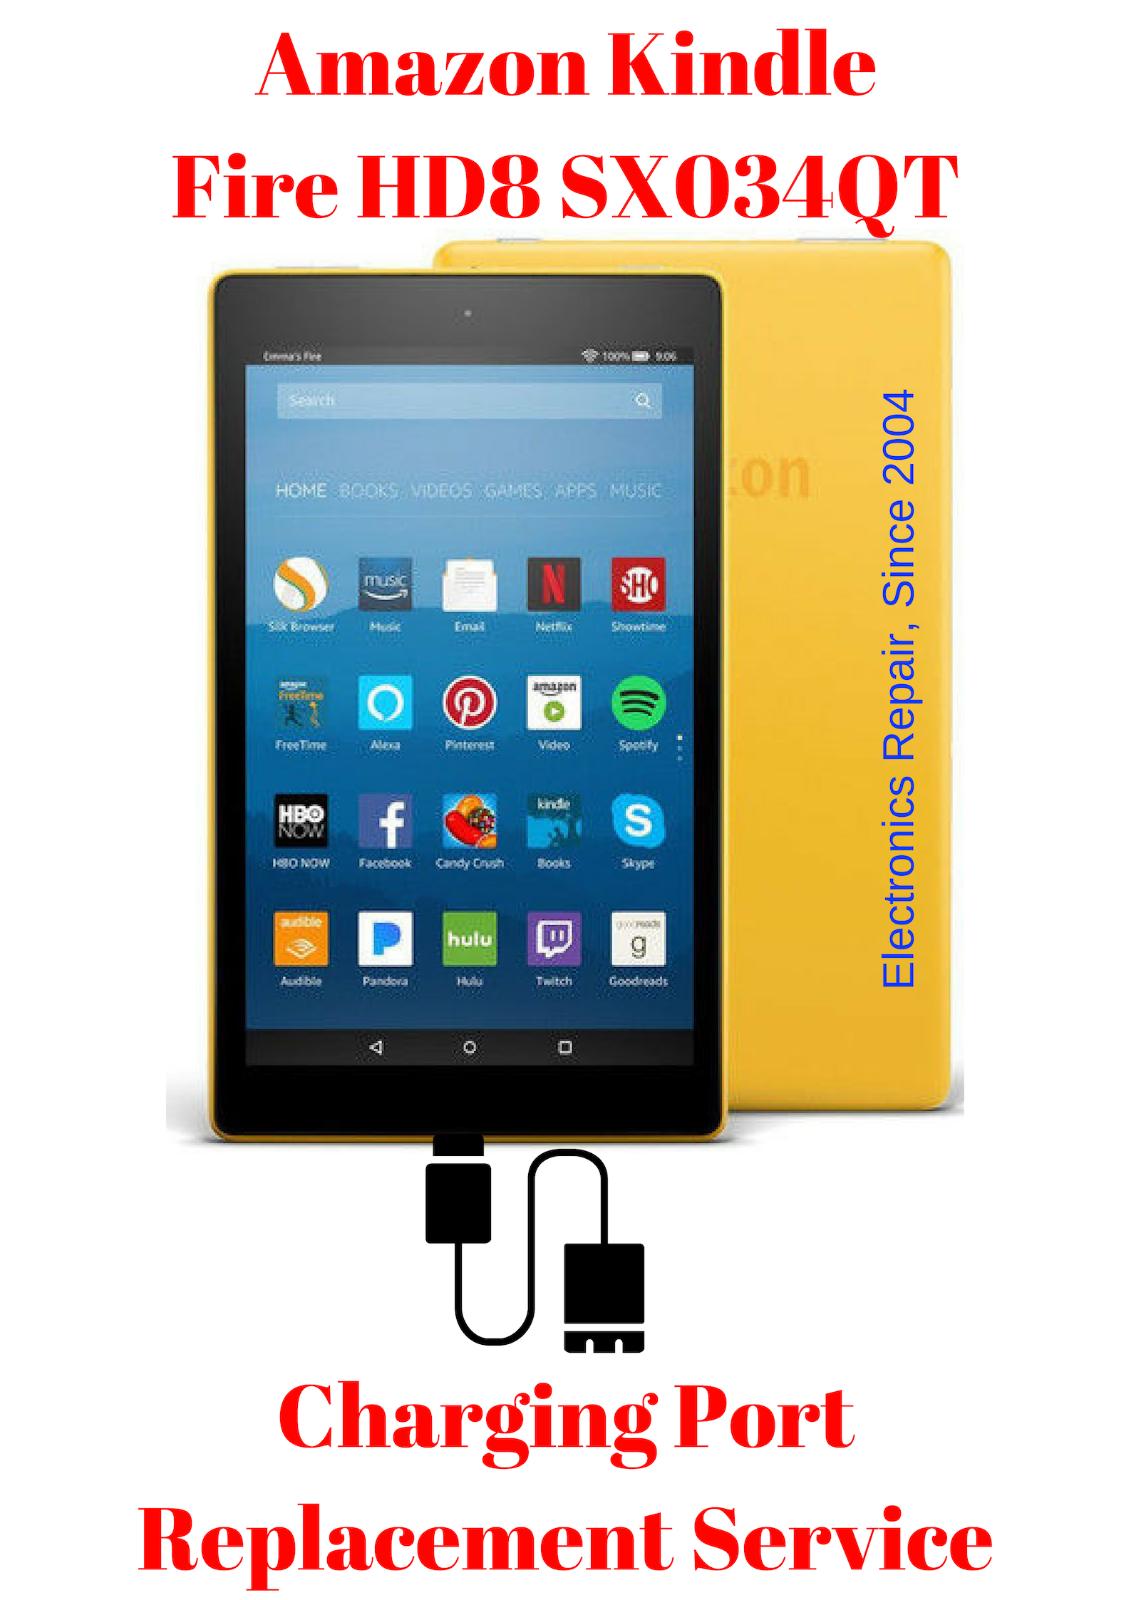 Details about Amazon Kindle Fire HD 8 SX034QT Tablet Charging Port Repair  Replacement Service